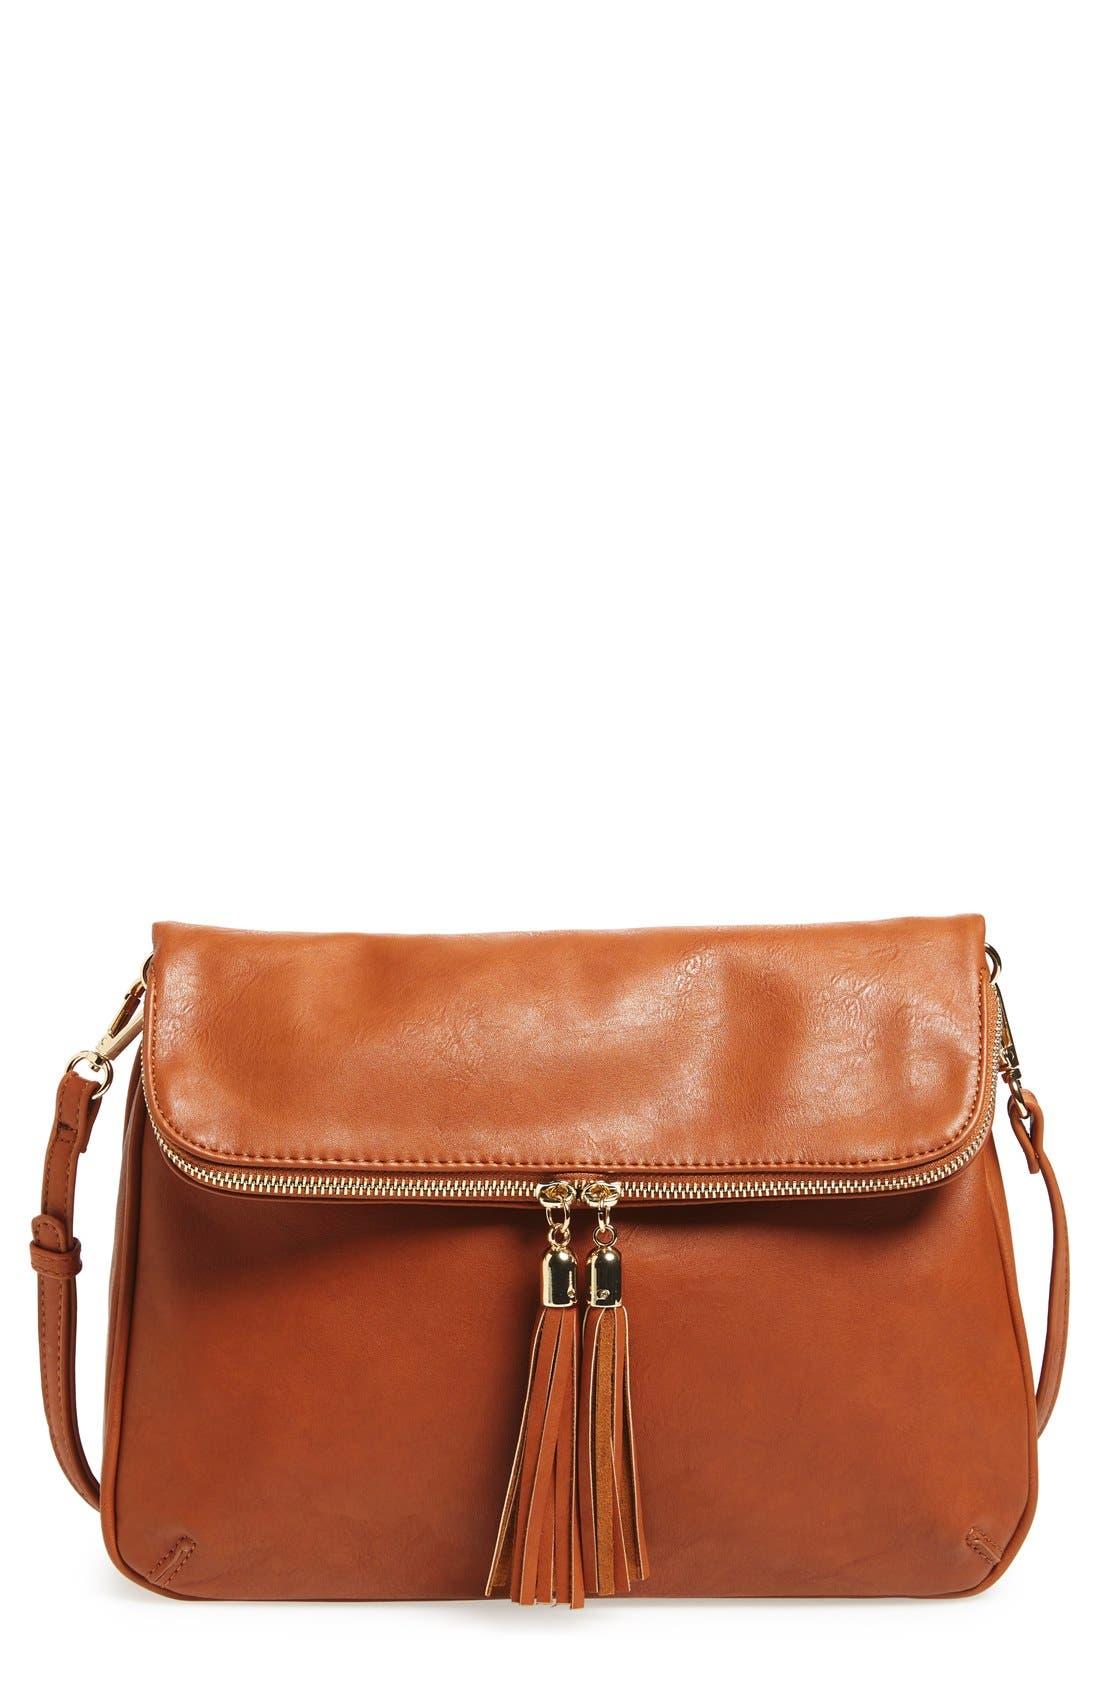 Alternate Image 1 Selected - BP. Foldover Crossbody Bag